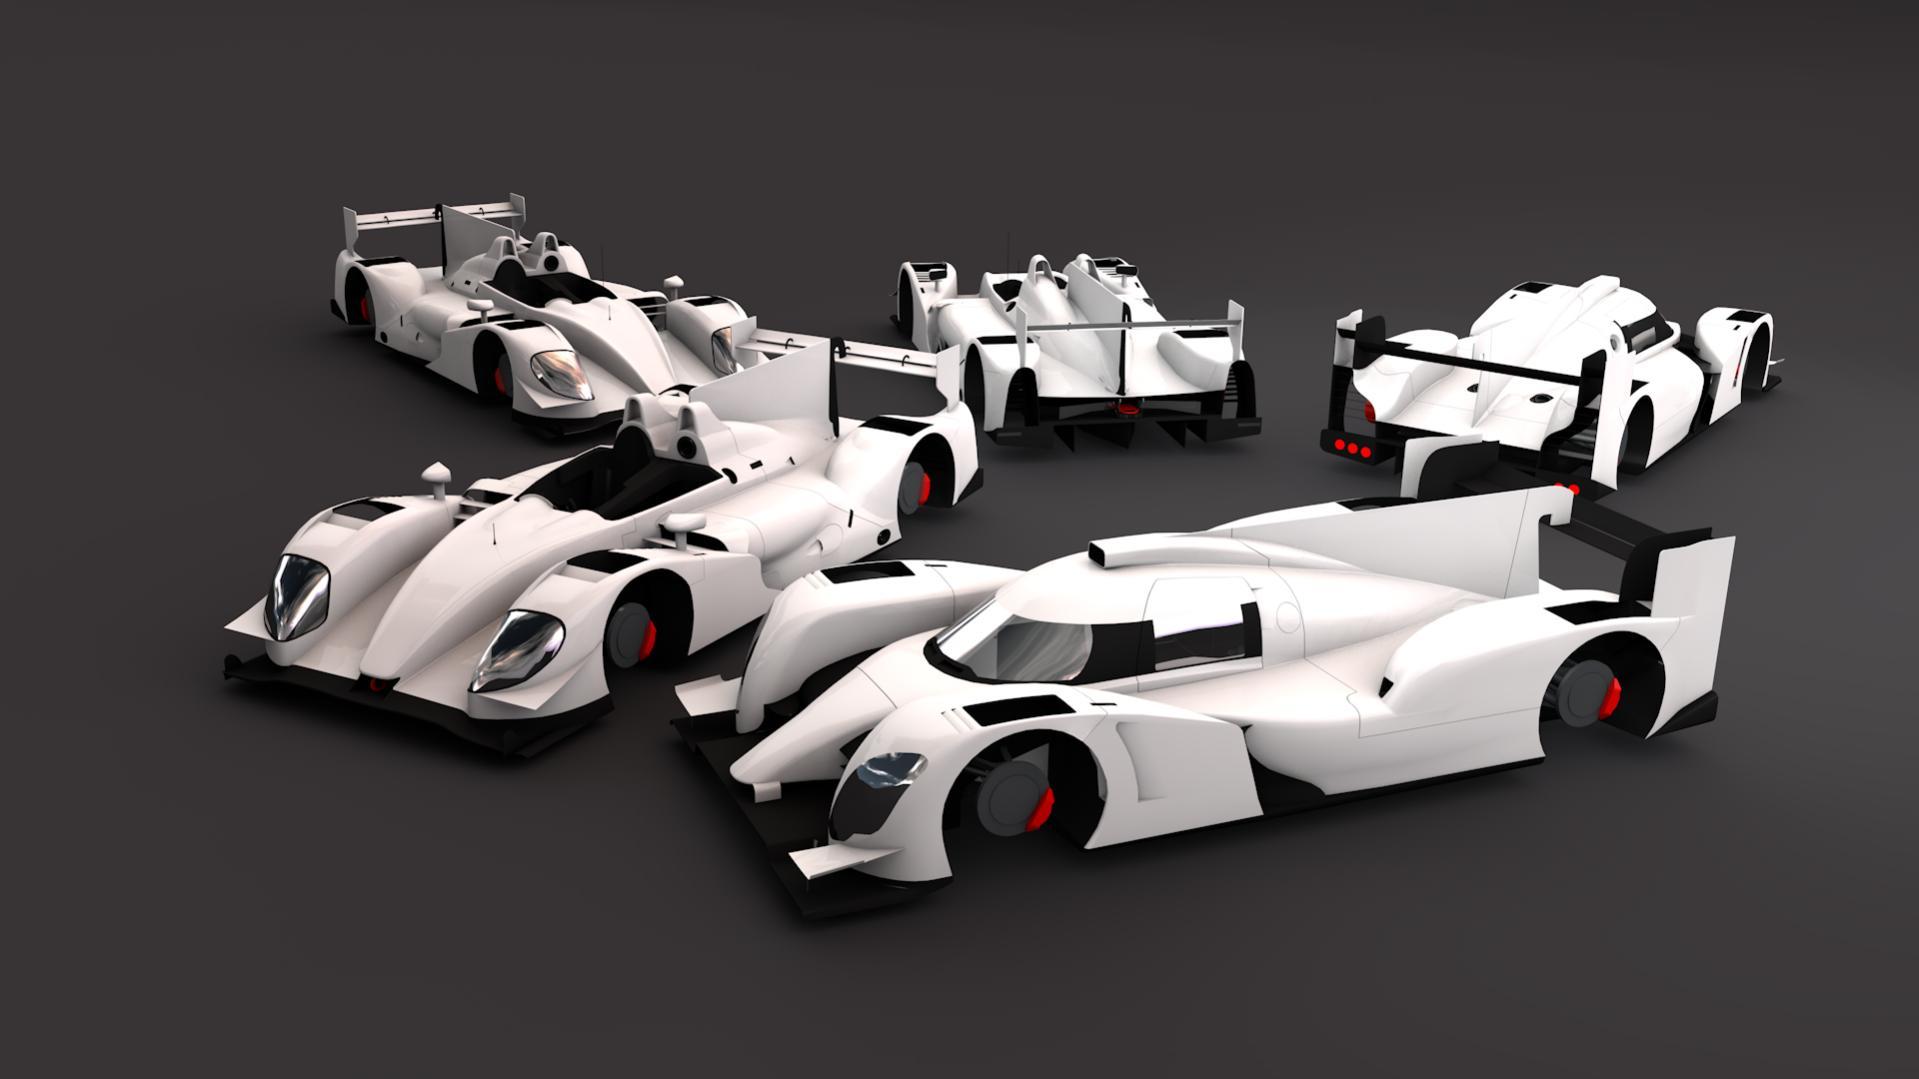 Endurance Racing X For Rfactor 2 Announced Virtualr